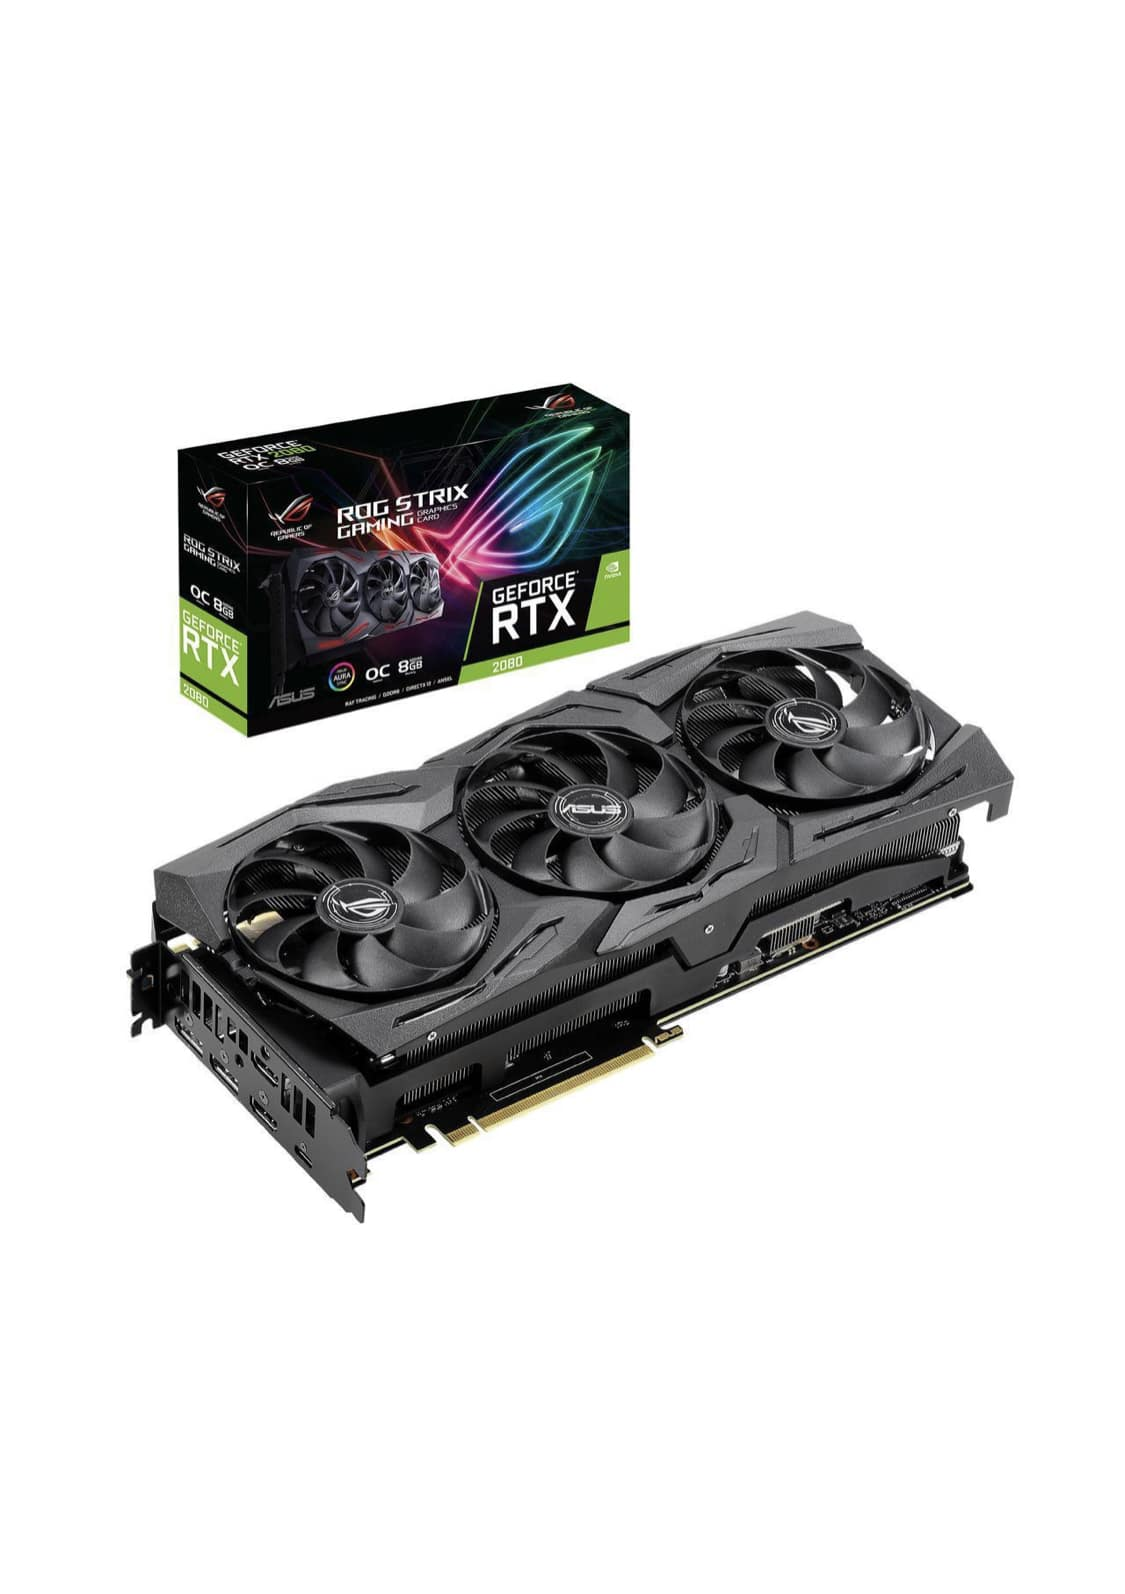 Open Box ASUS ROG STRIX GeForce RTX 2080 8GB Overclocked + F/S $591.99